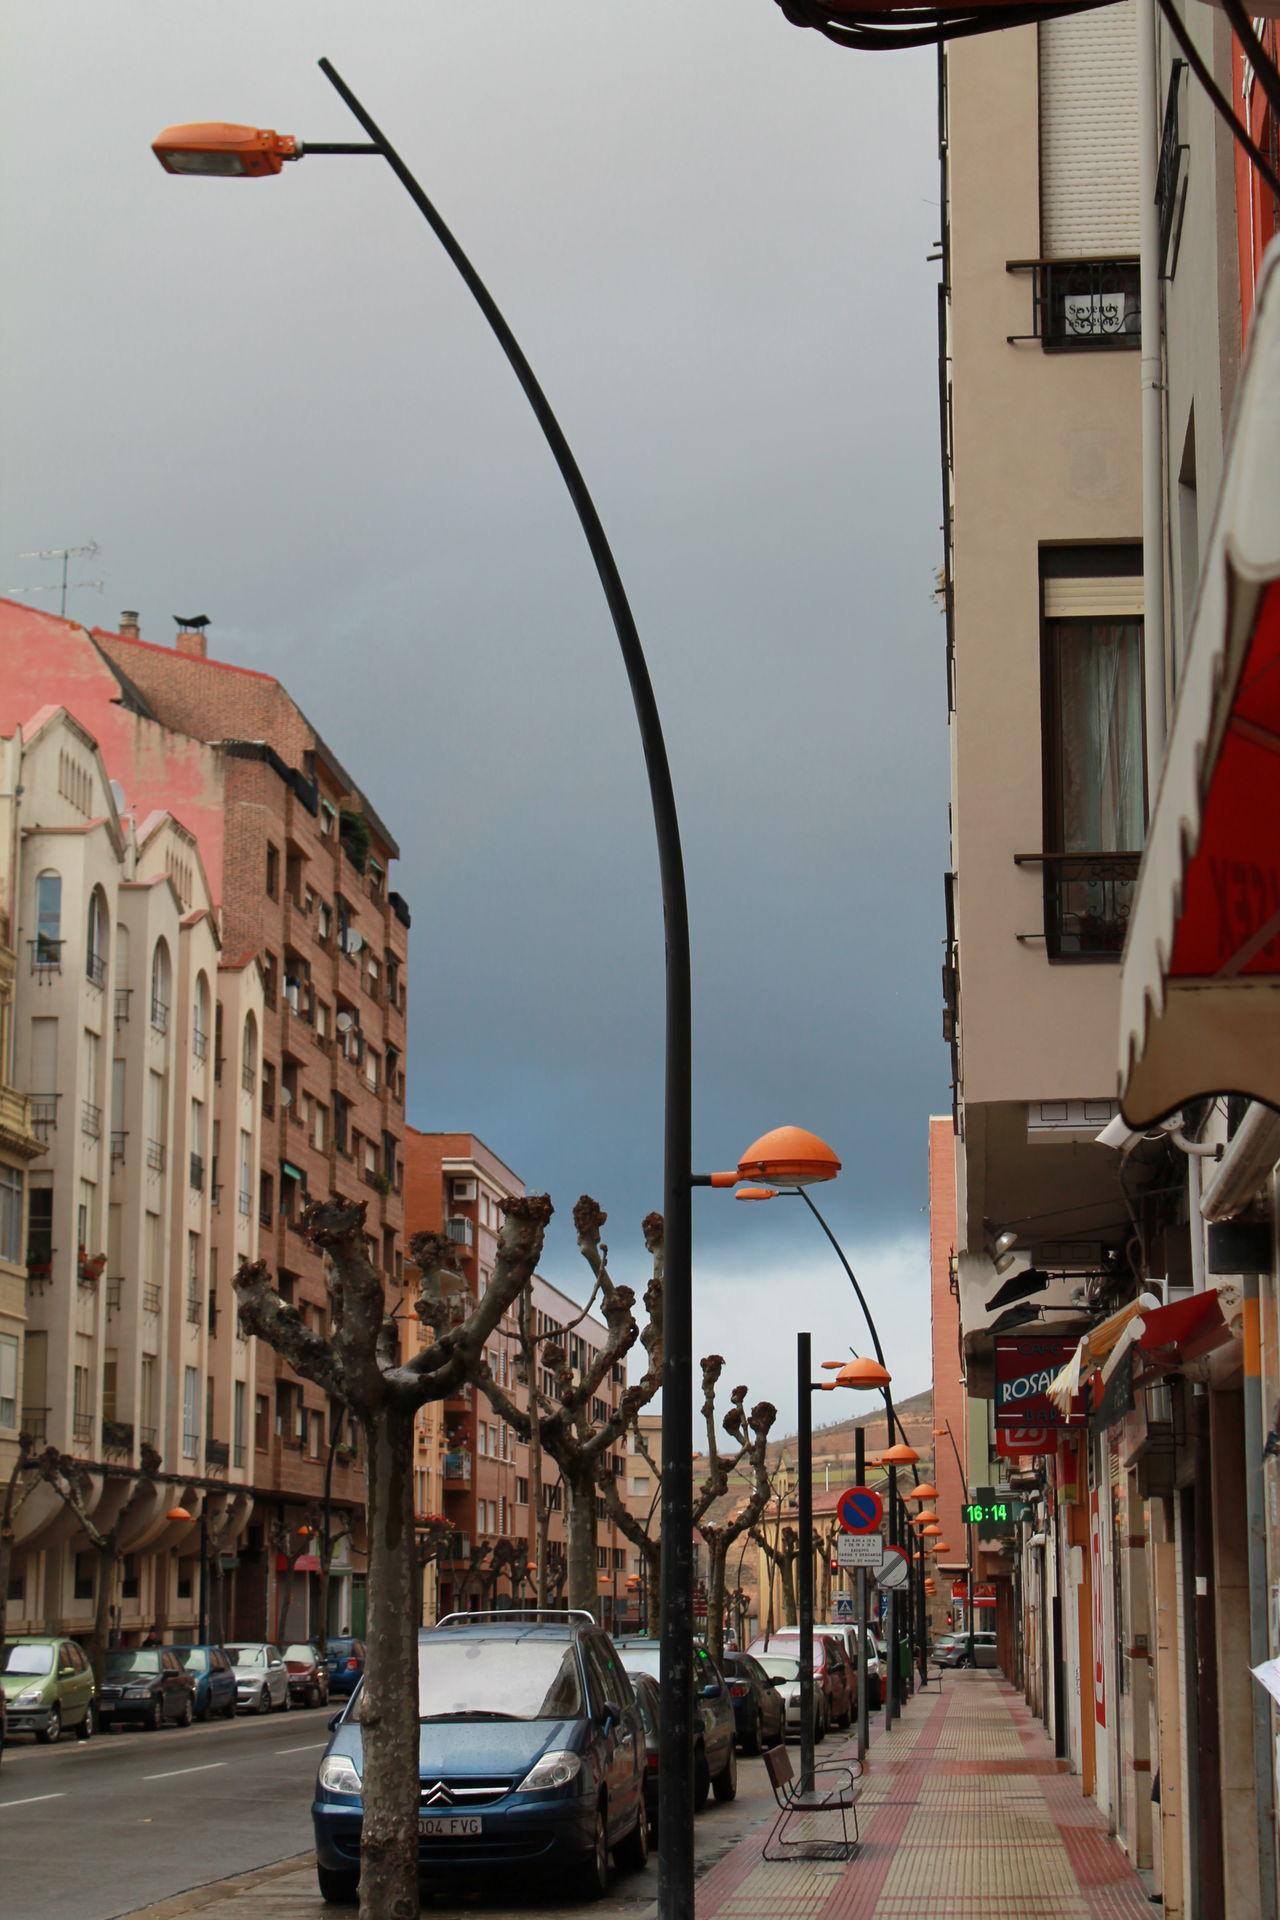 Un dia especial No Edit City City Street Day Raining Spain ✈️🇪🇸 Imagen Logroño